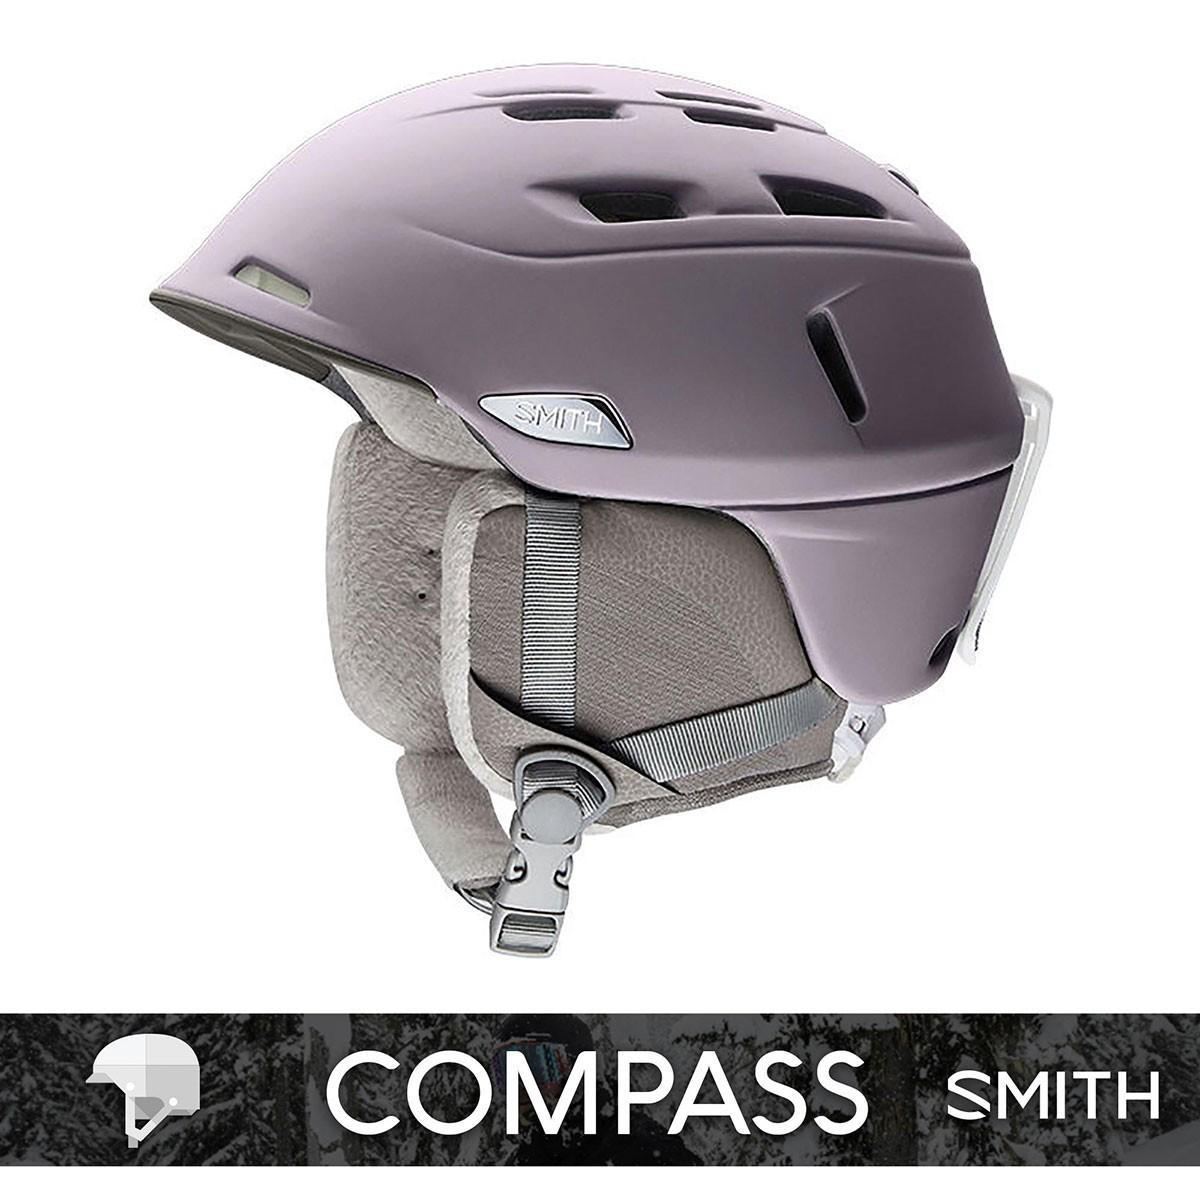 SMITH COMPASS matte Lunar - Изображение - AQUAMATRIX